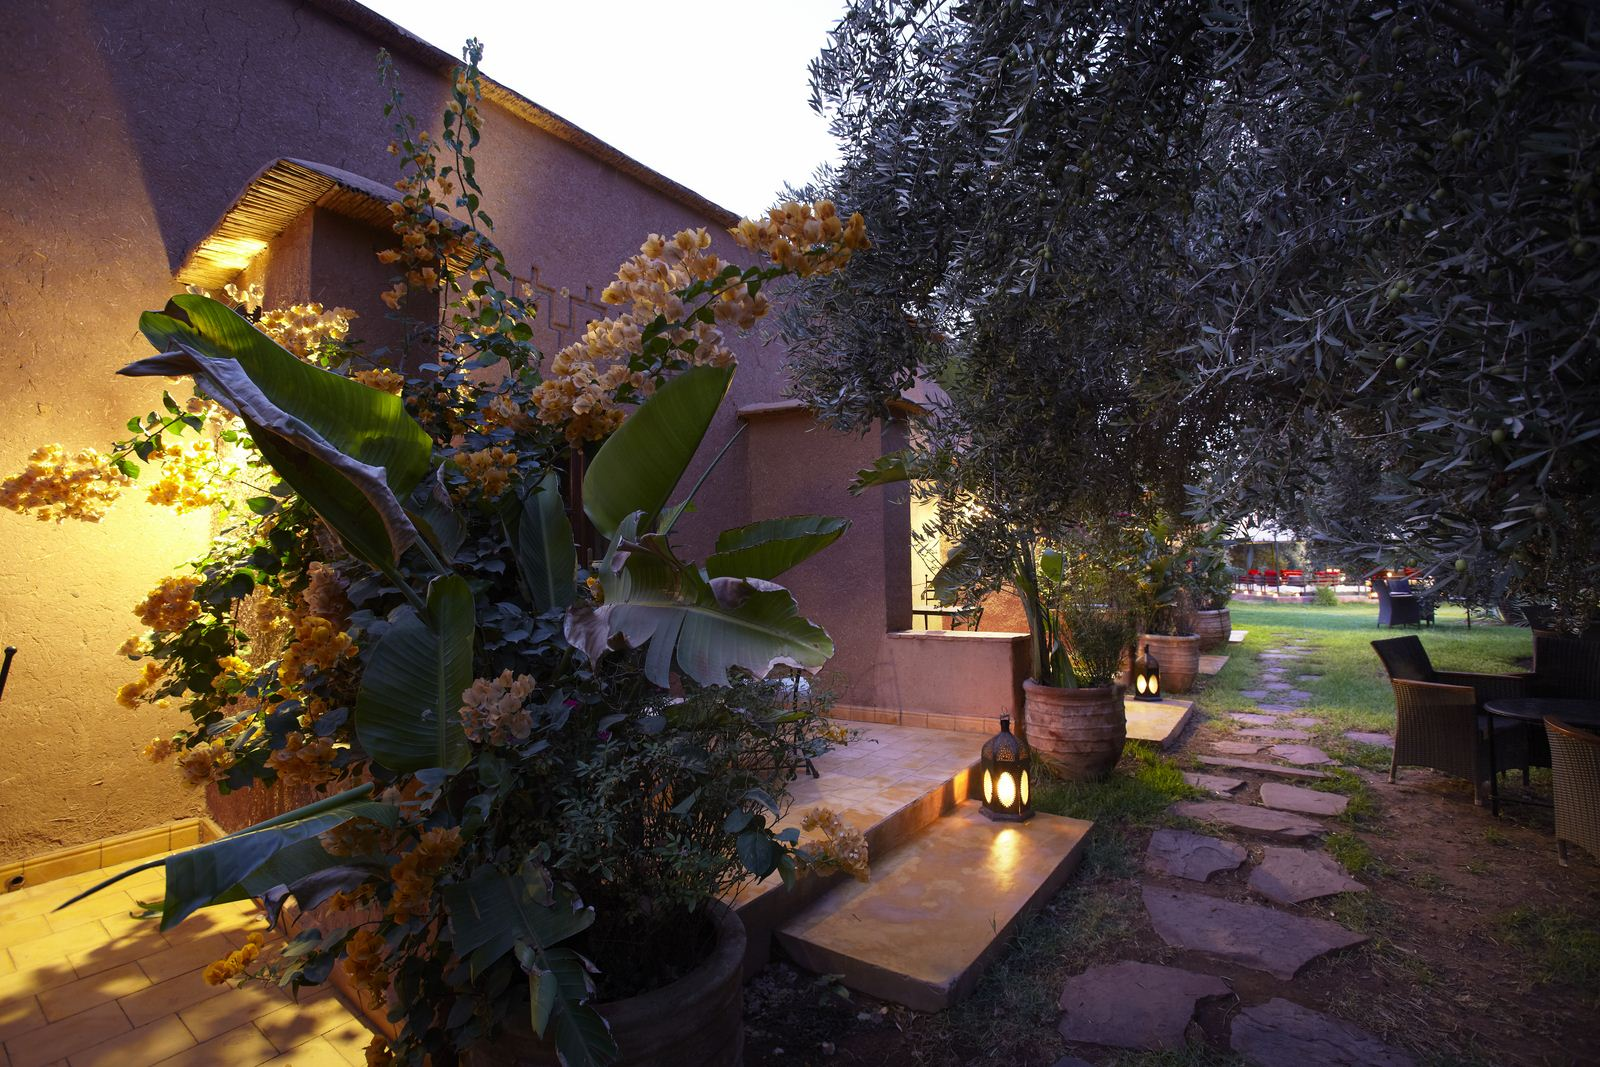 Le jardin dar 39 zarraba for Exterieur nuit